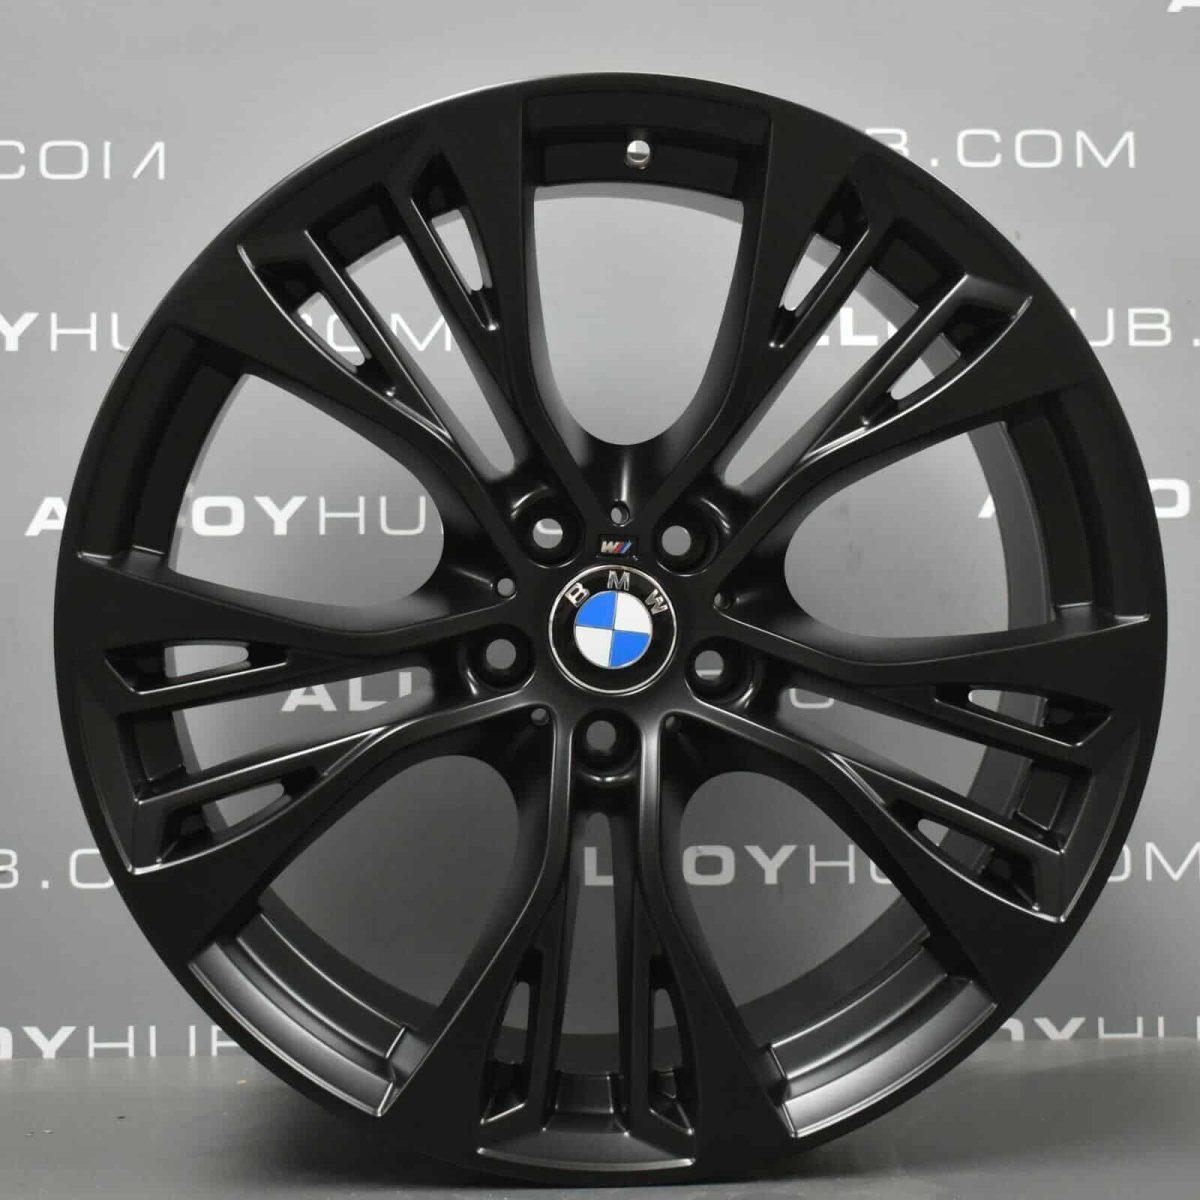 Genuine BMW X5 X6 F15 F16 Style 599M Sport Performance 21″ inch Alloy Wheels with Satin Black Finish 36116859423 36116859424